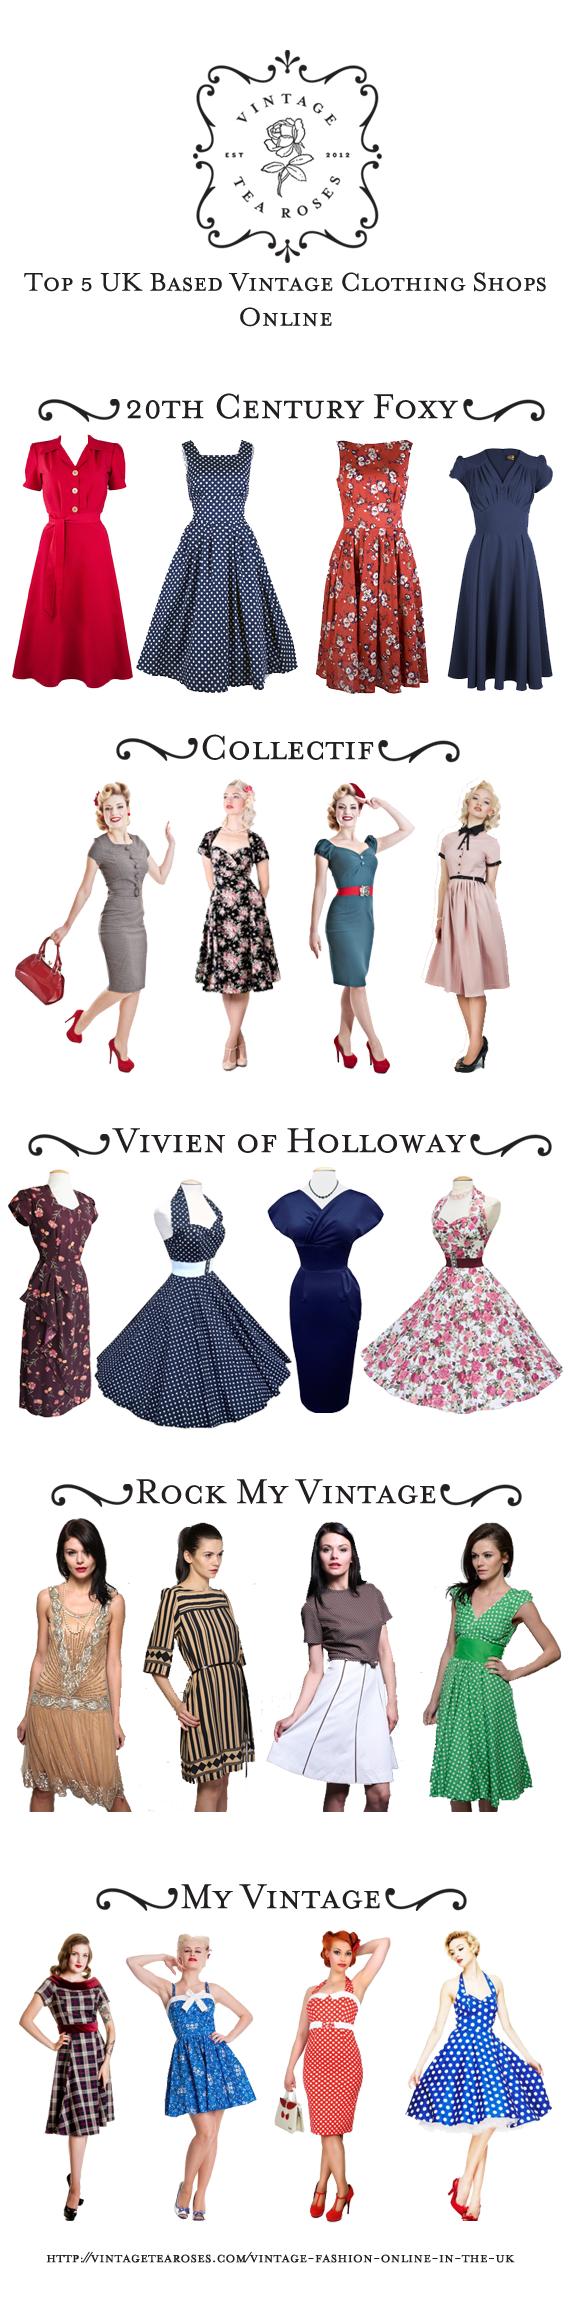 Vintage Fashion Online In The Uk Vintage Tea Roses Vintage Fashion Online Vintage Clothes Shop Vintage Outfits